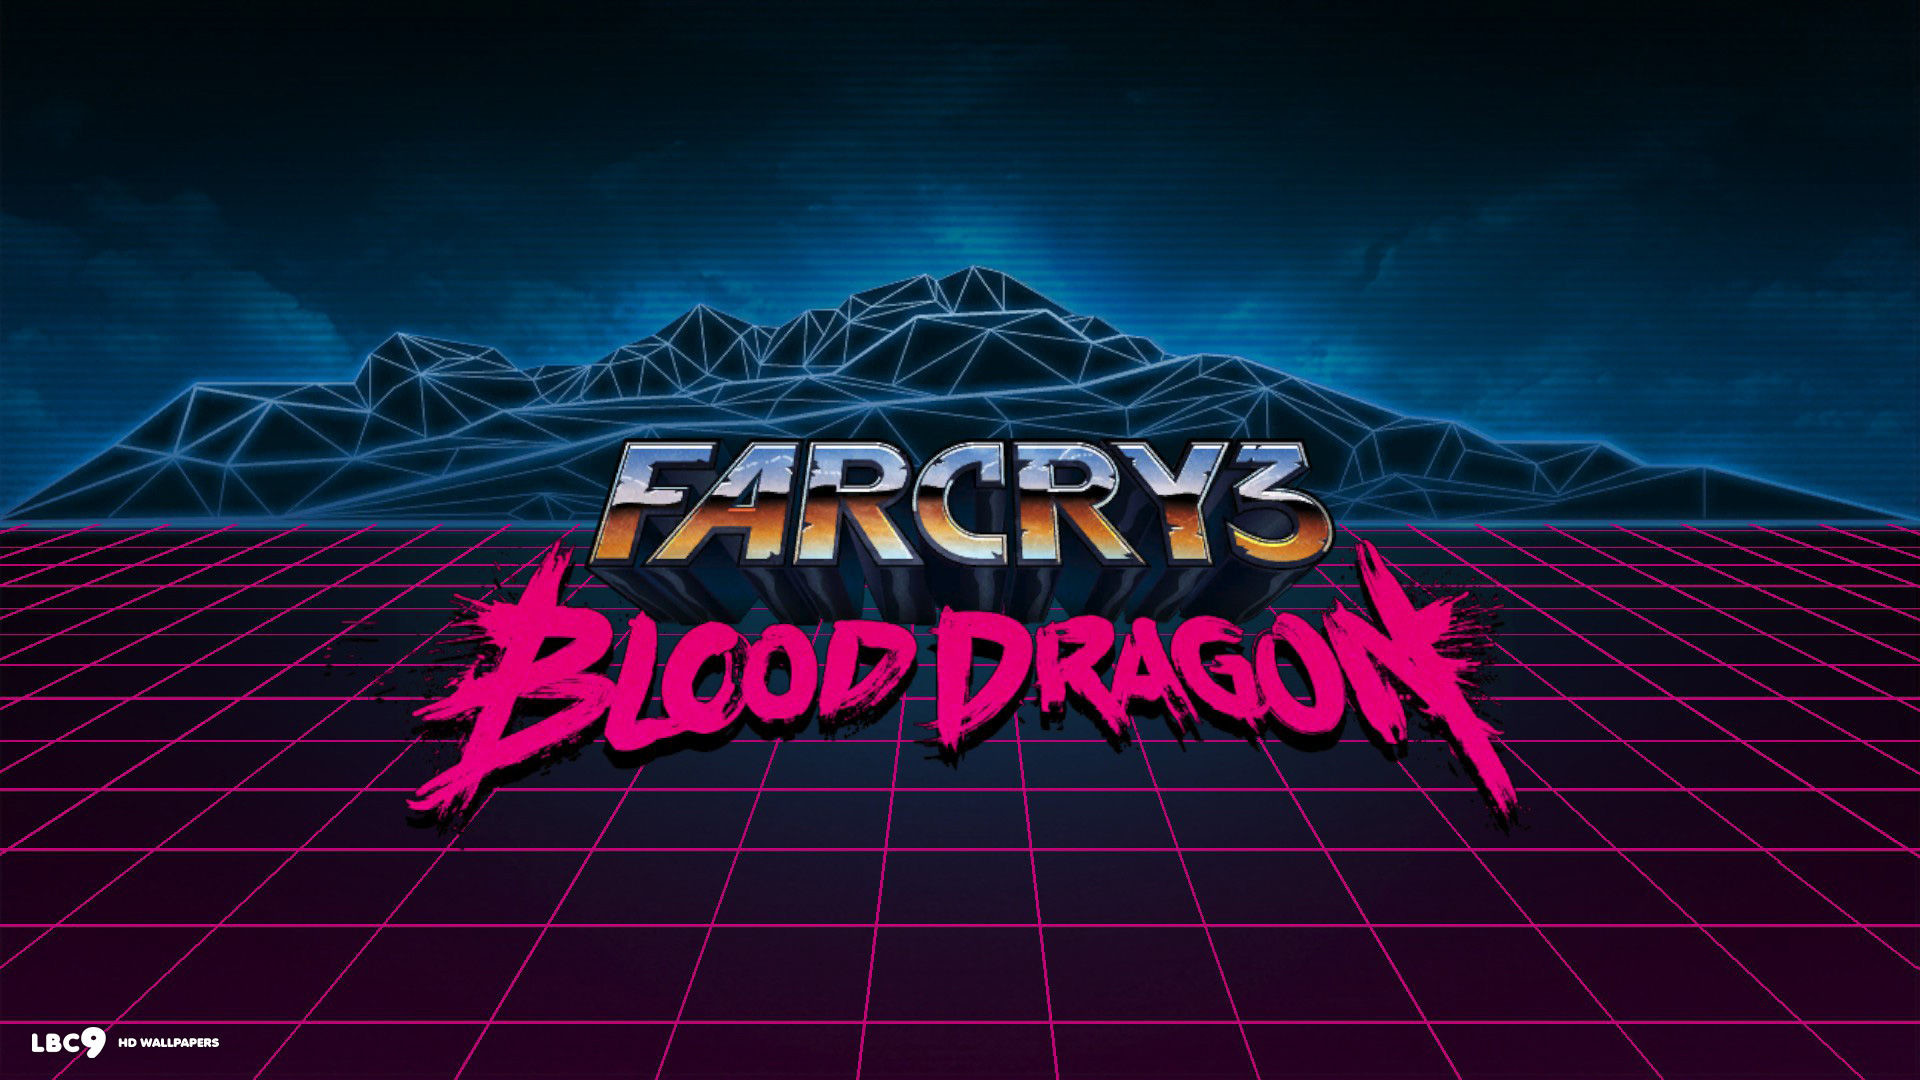 far cry 3 blood dragon logo wallpaper